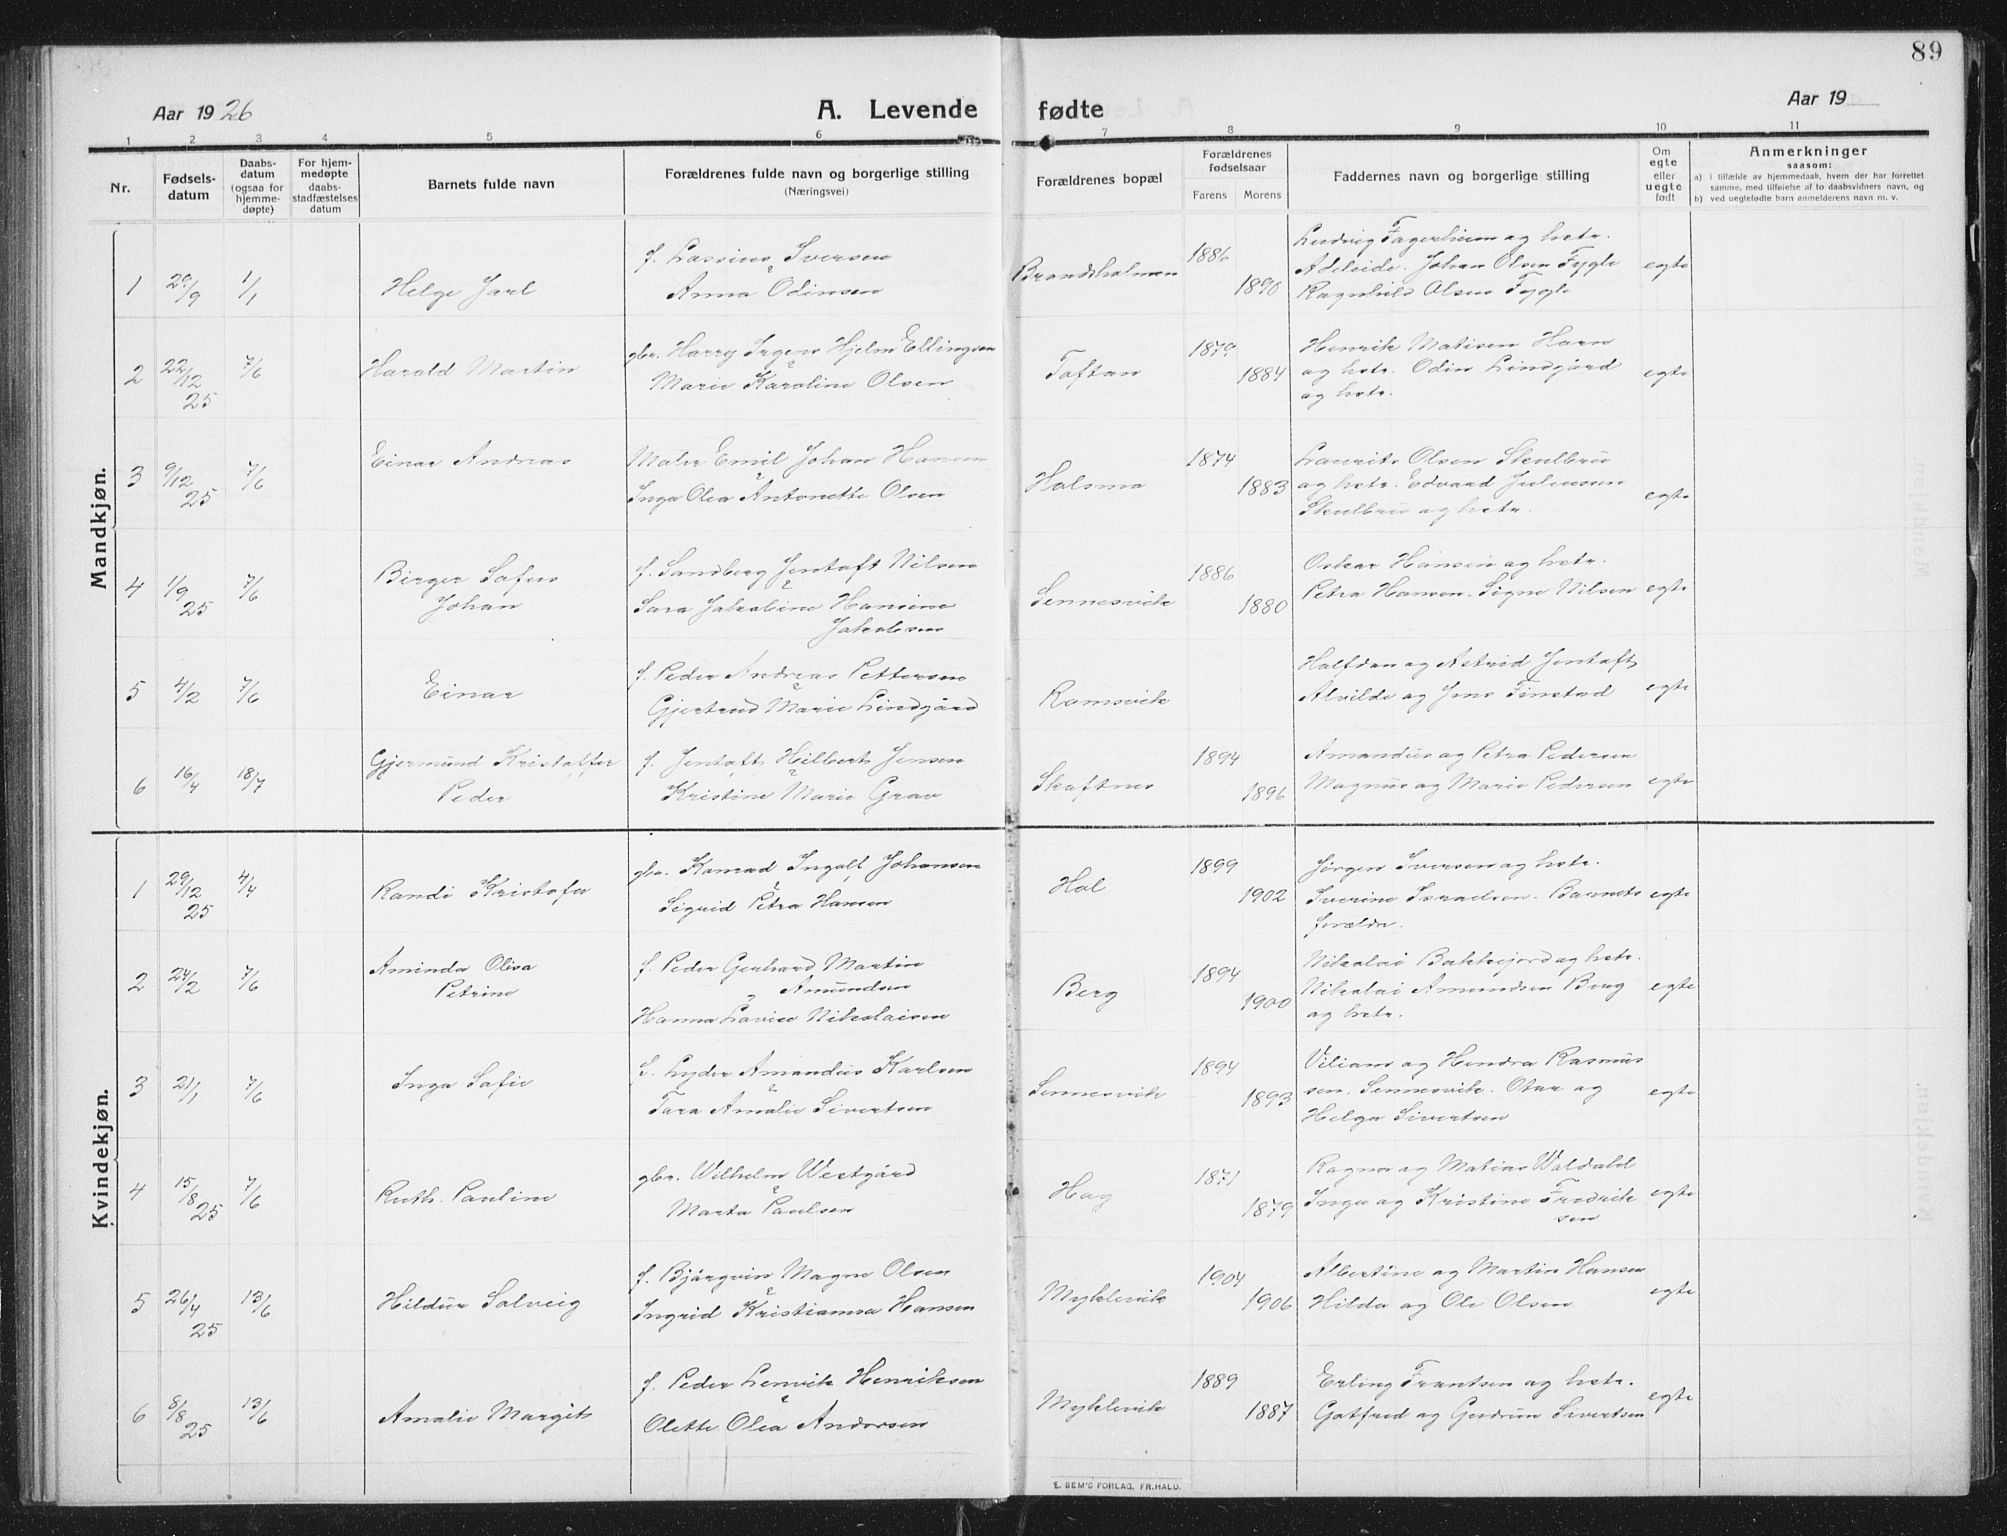 SAT, Ministerialprotokoller, klokkerbøker og fødselsregistre - Nordland, 882/L1183: Klokkerbok nr. 882C01, 1911-1938, s. 89